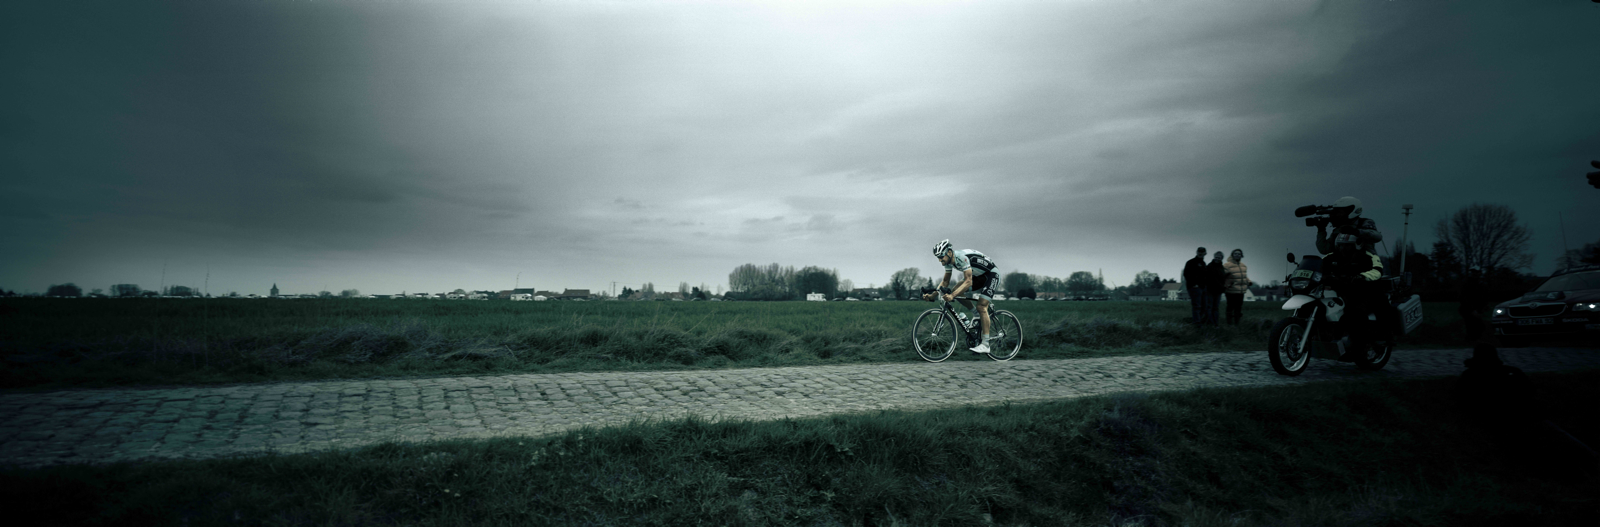 Radsport, Monument, Klassiker